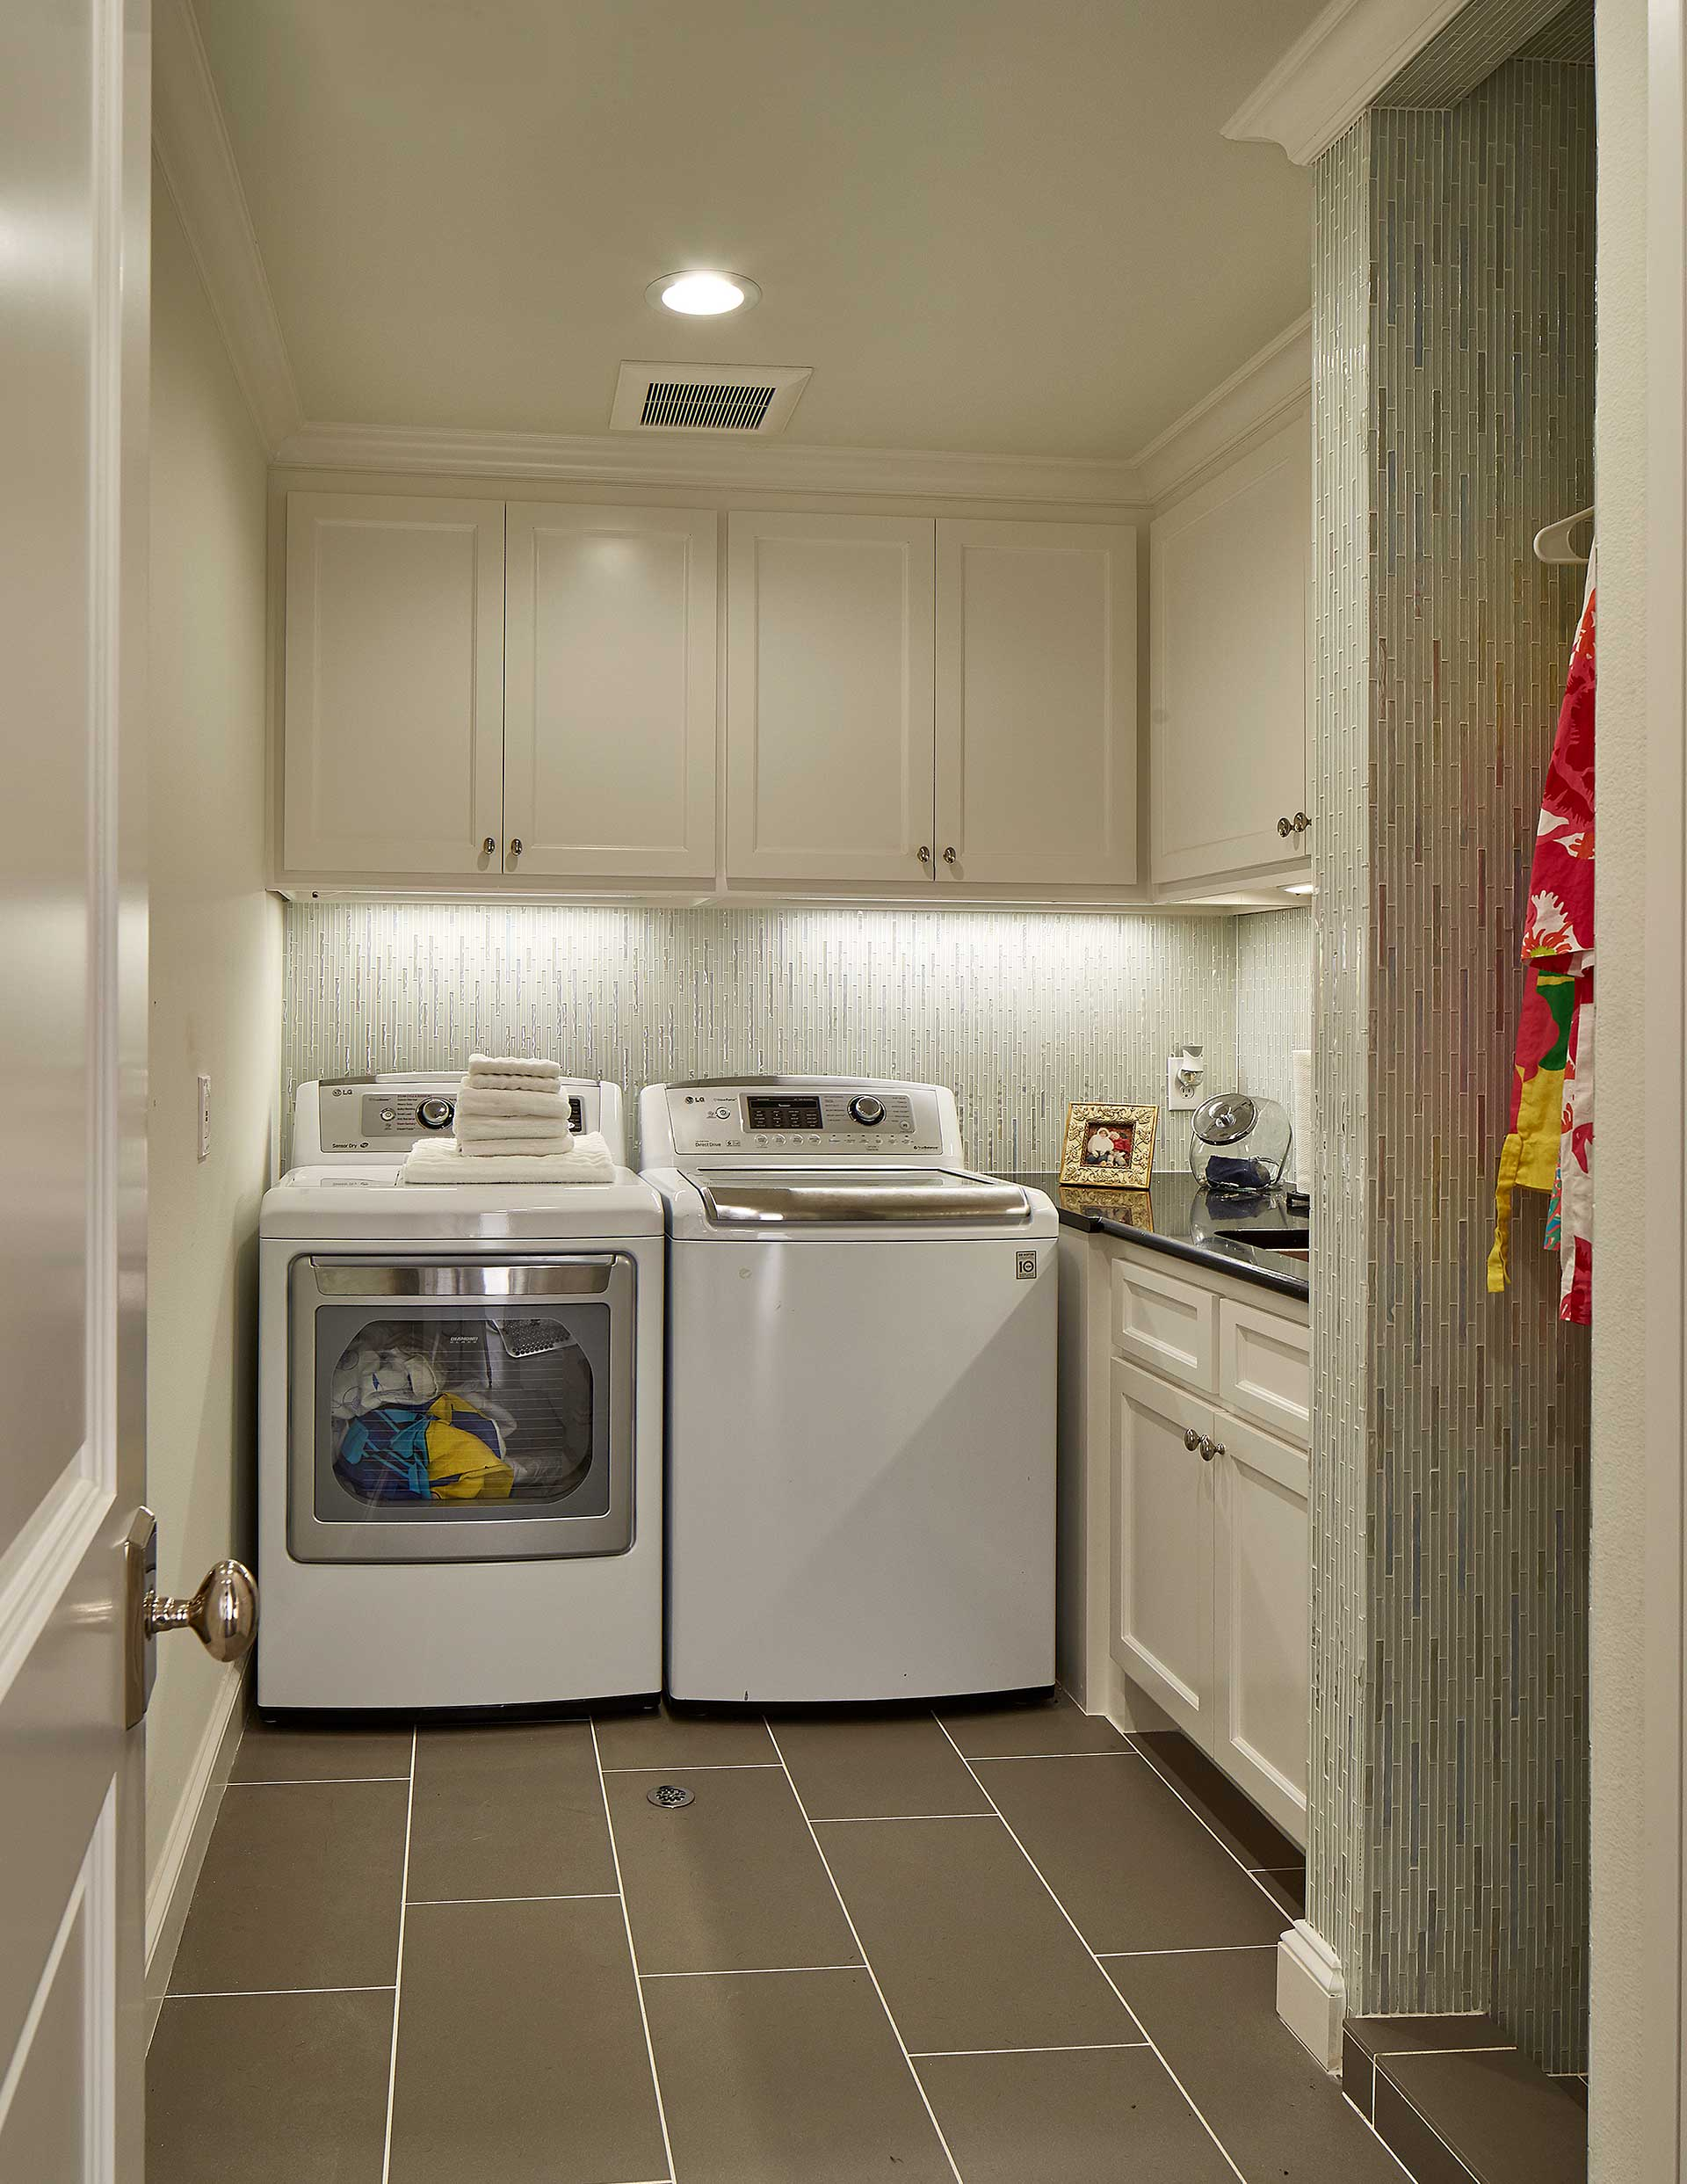 Preston Hollow Luxury Laundry Room Renovation Blackline Renovations